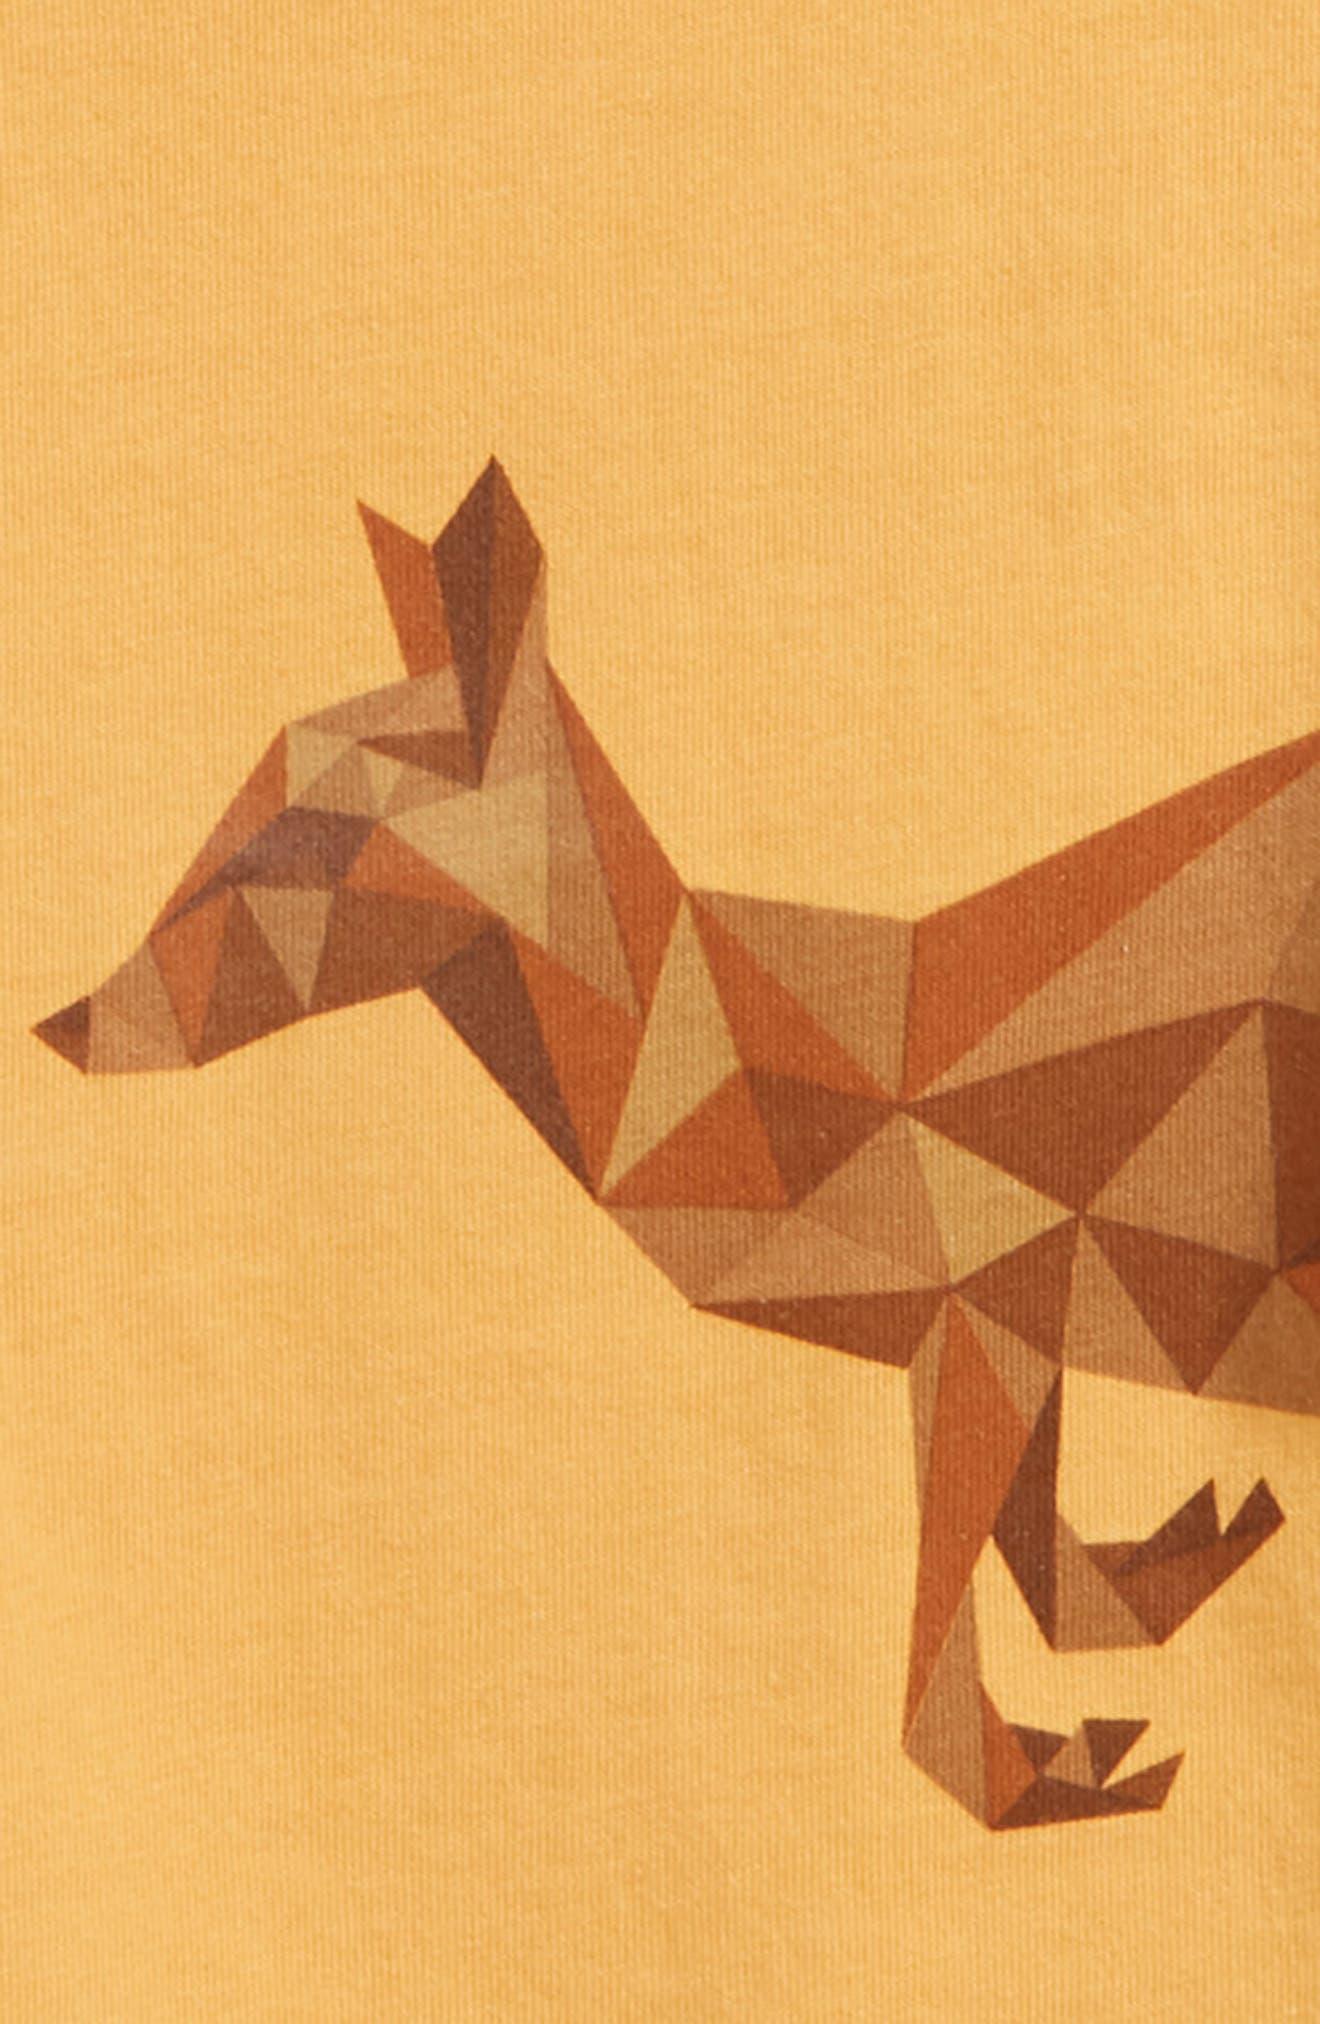 Kangaroo Graphic T-Shirt,                             Alternate thumbnail 2, color,                             700